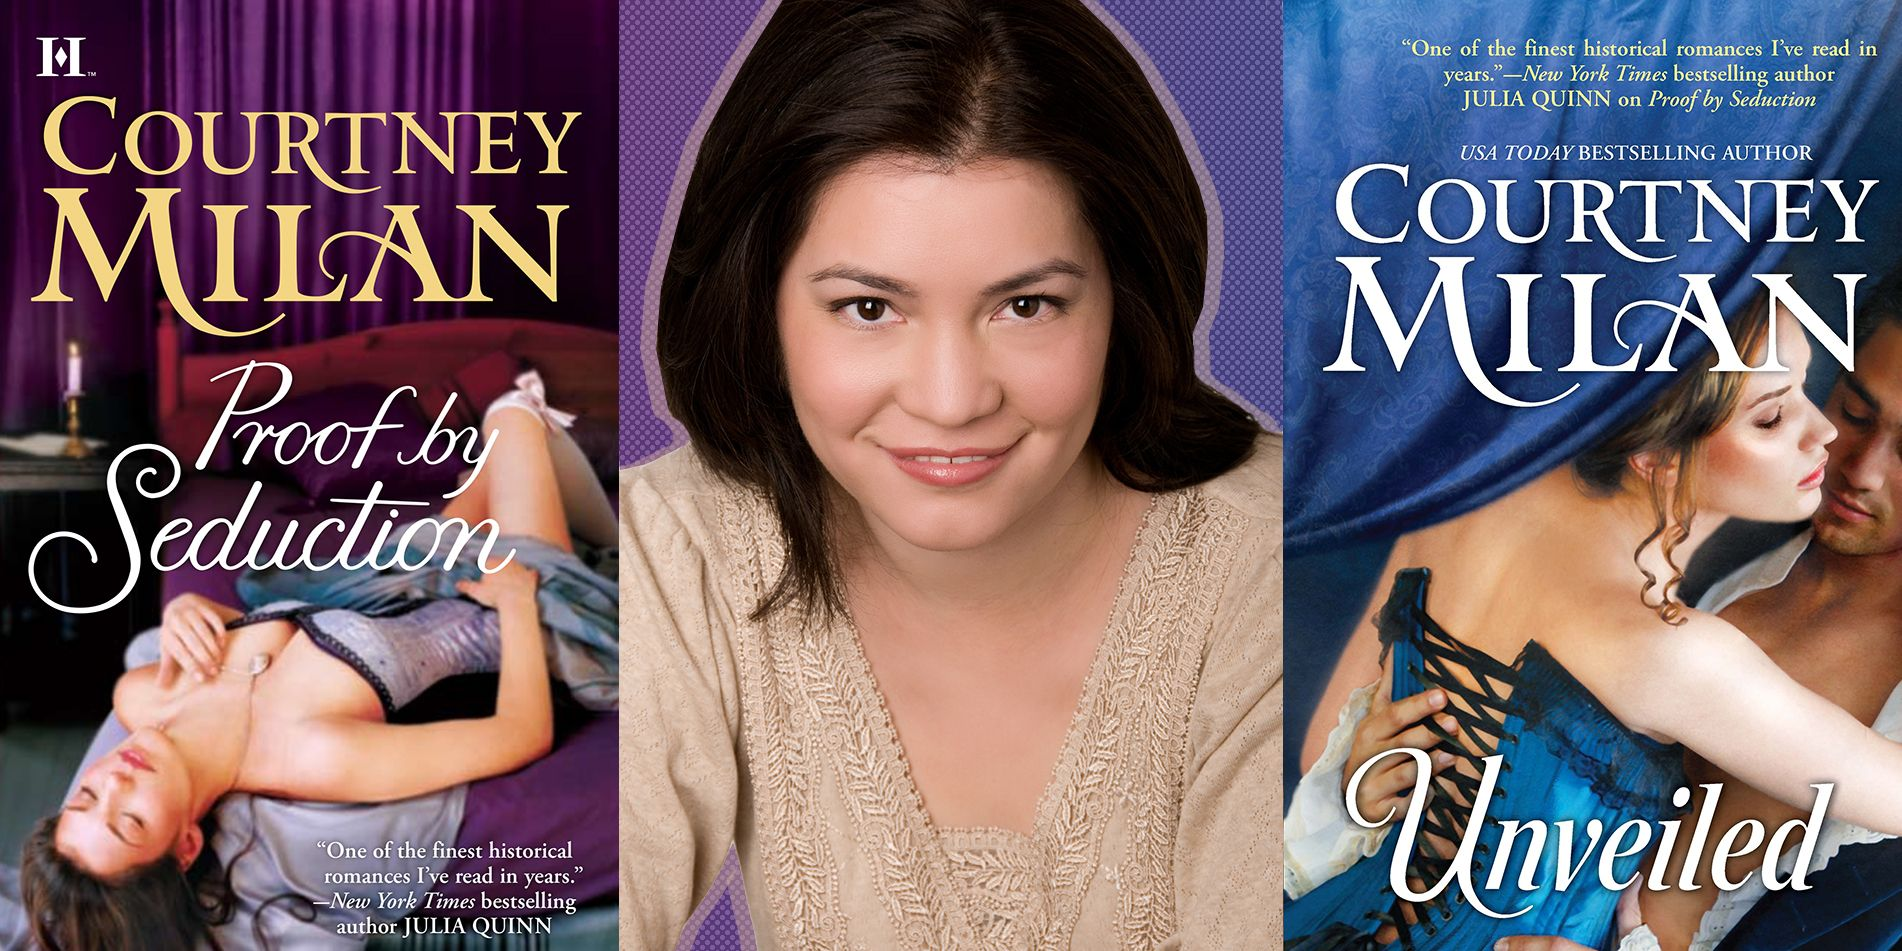 Courtney Milan on Feminism and the Romance Novel